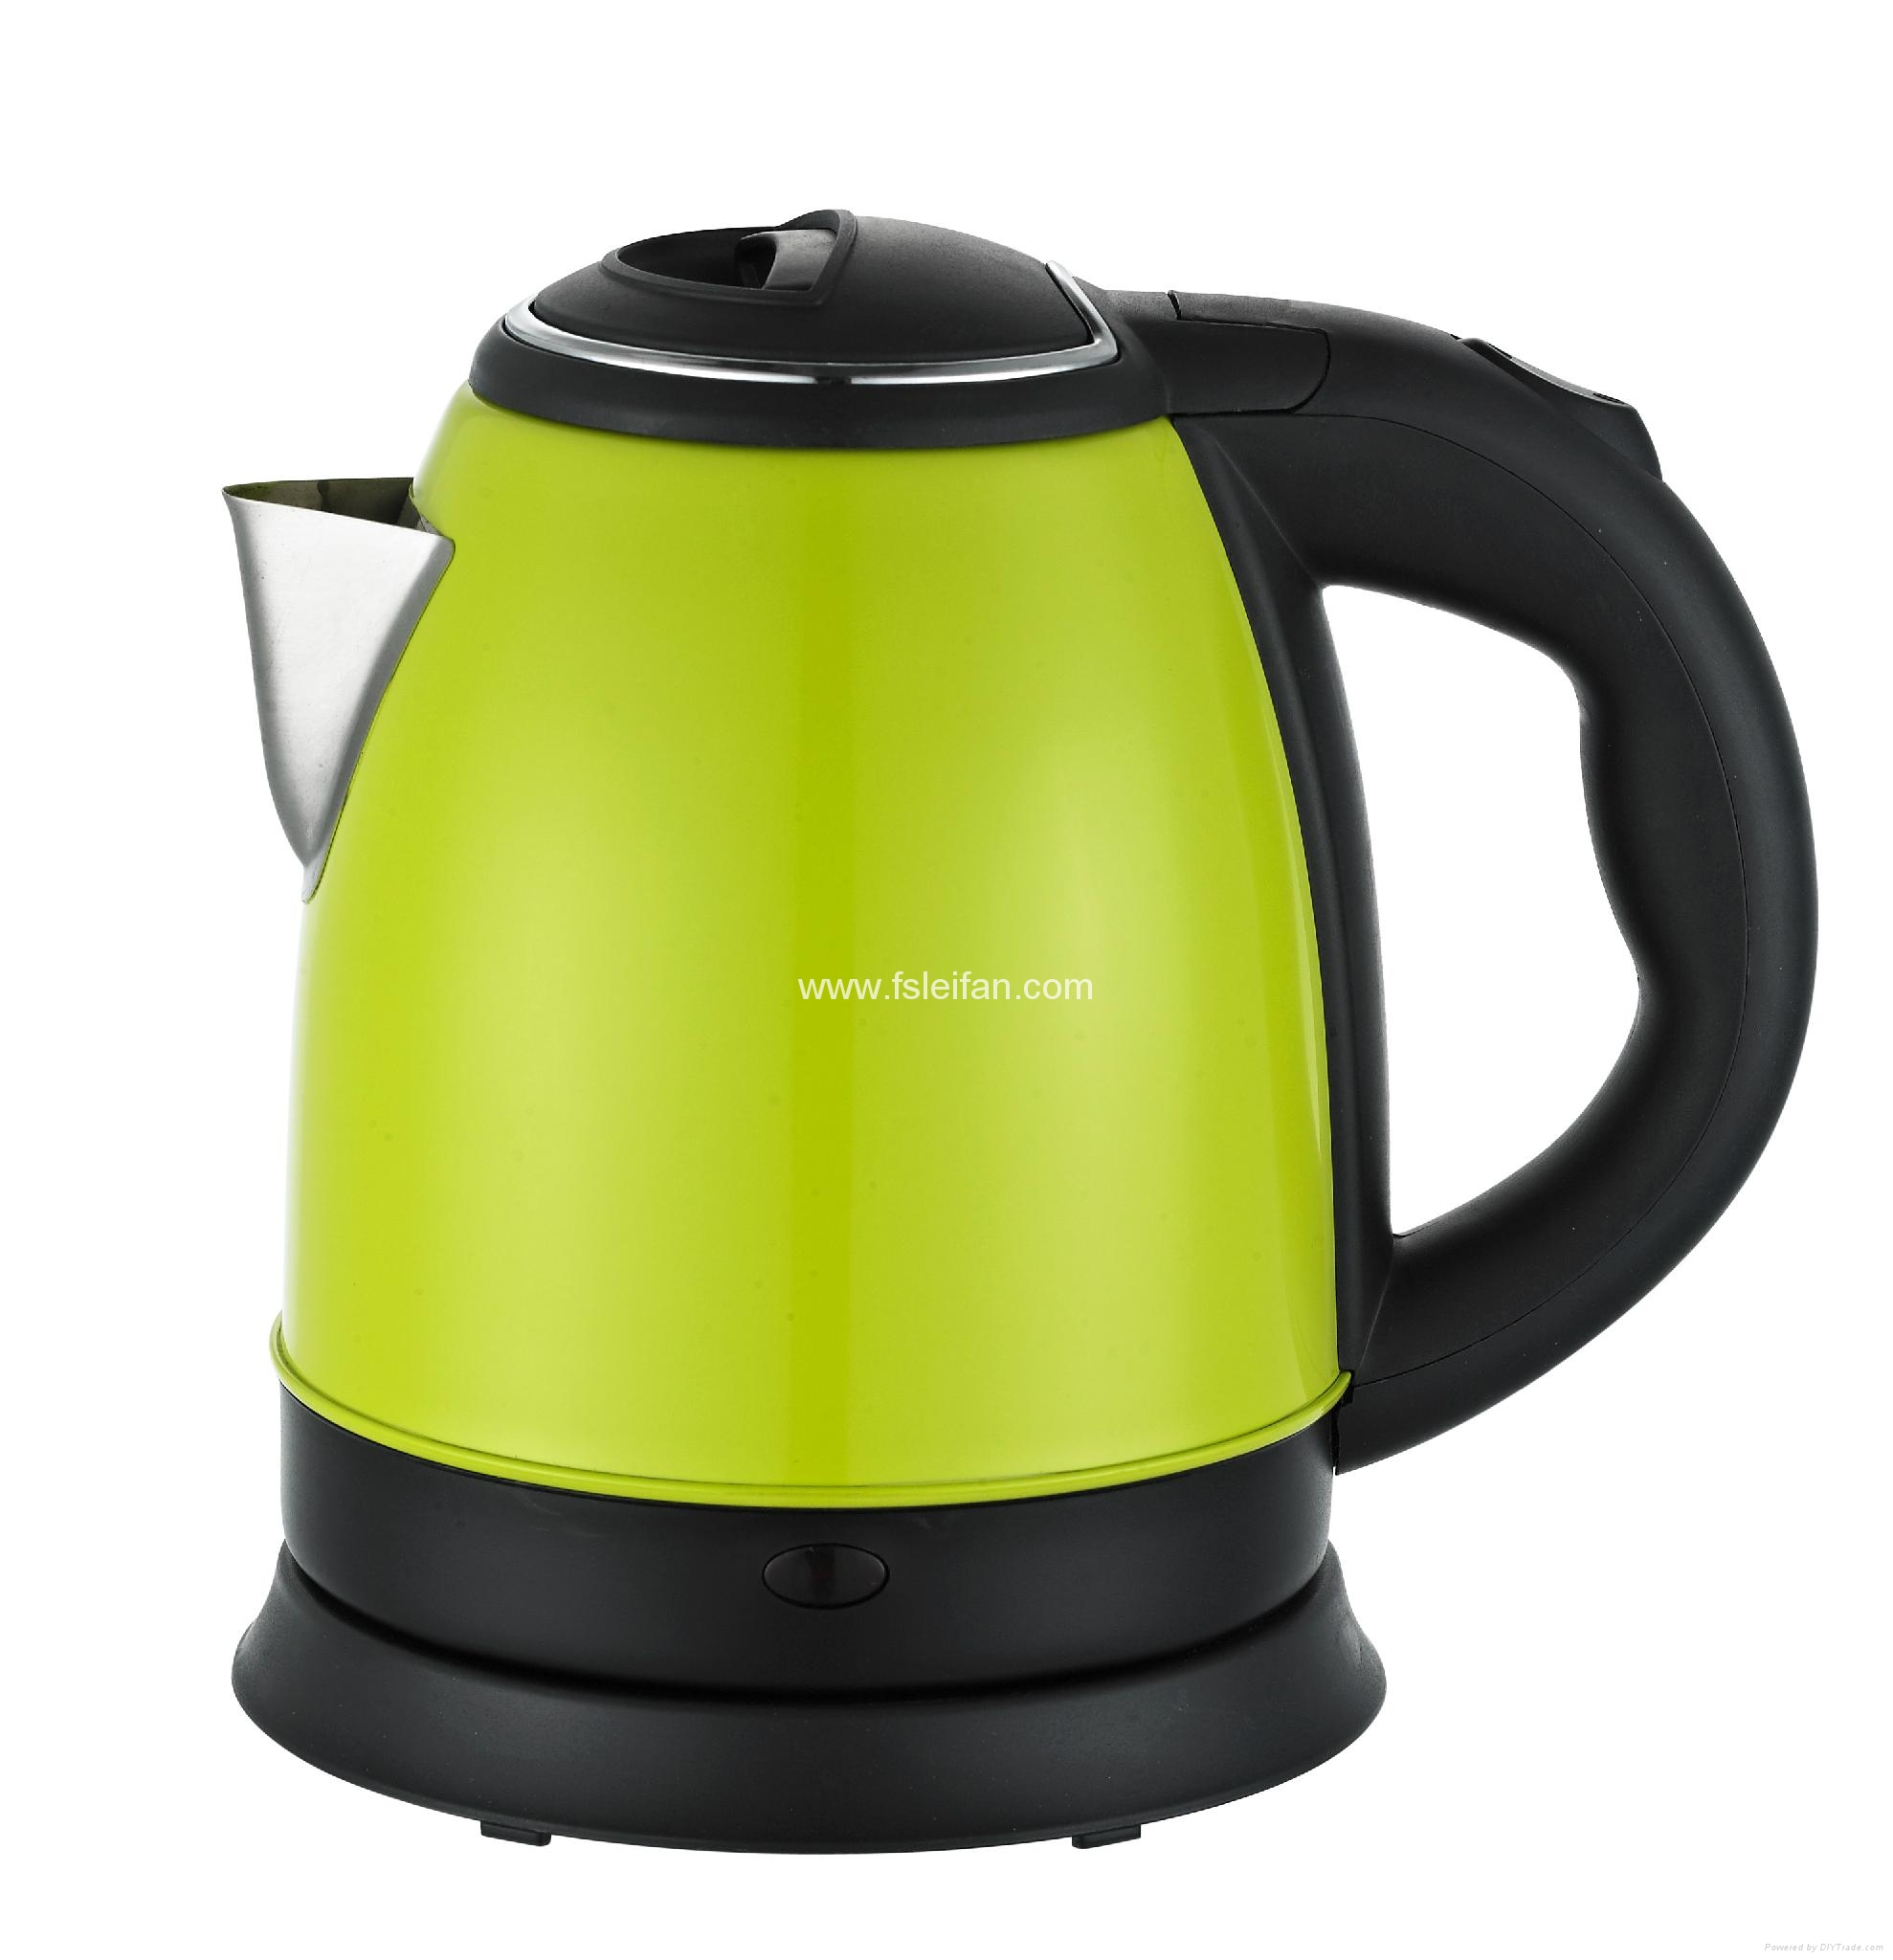 Electric kettle home appliance stainless steel tea kettle 5